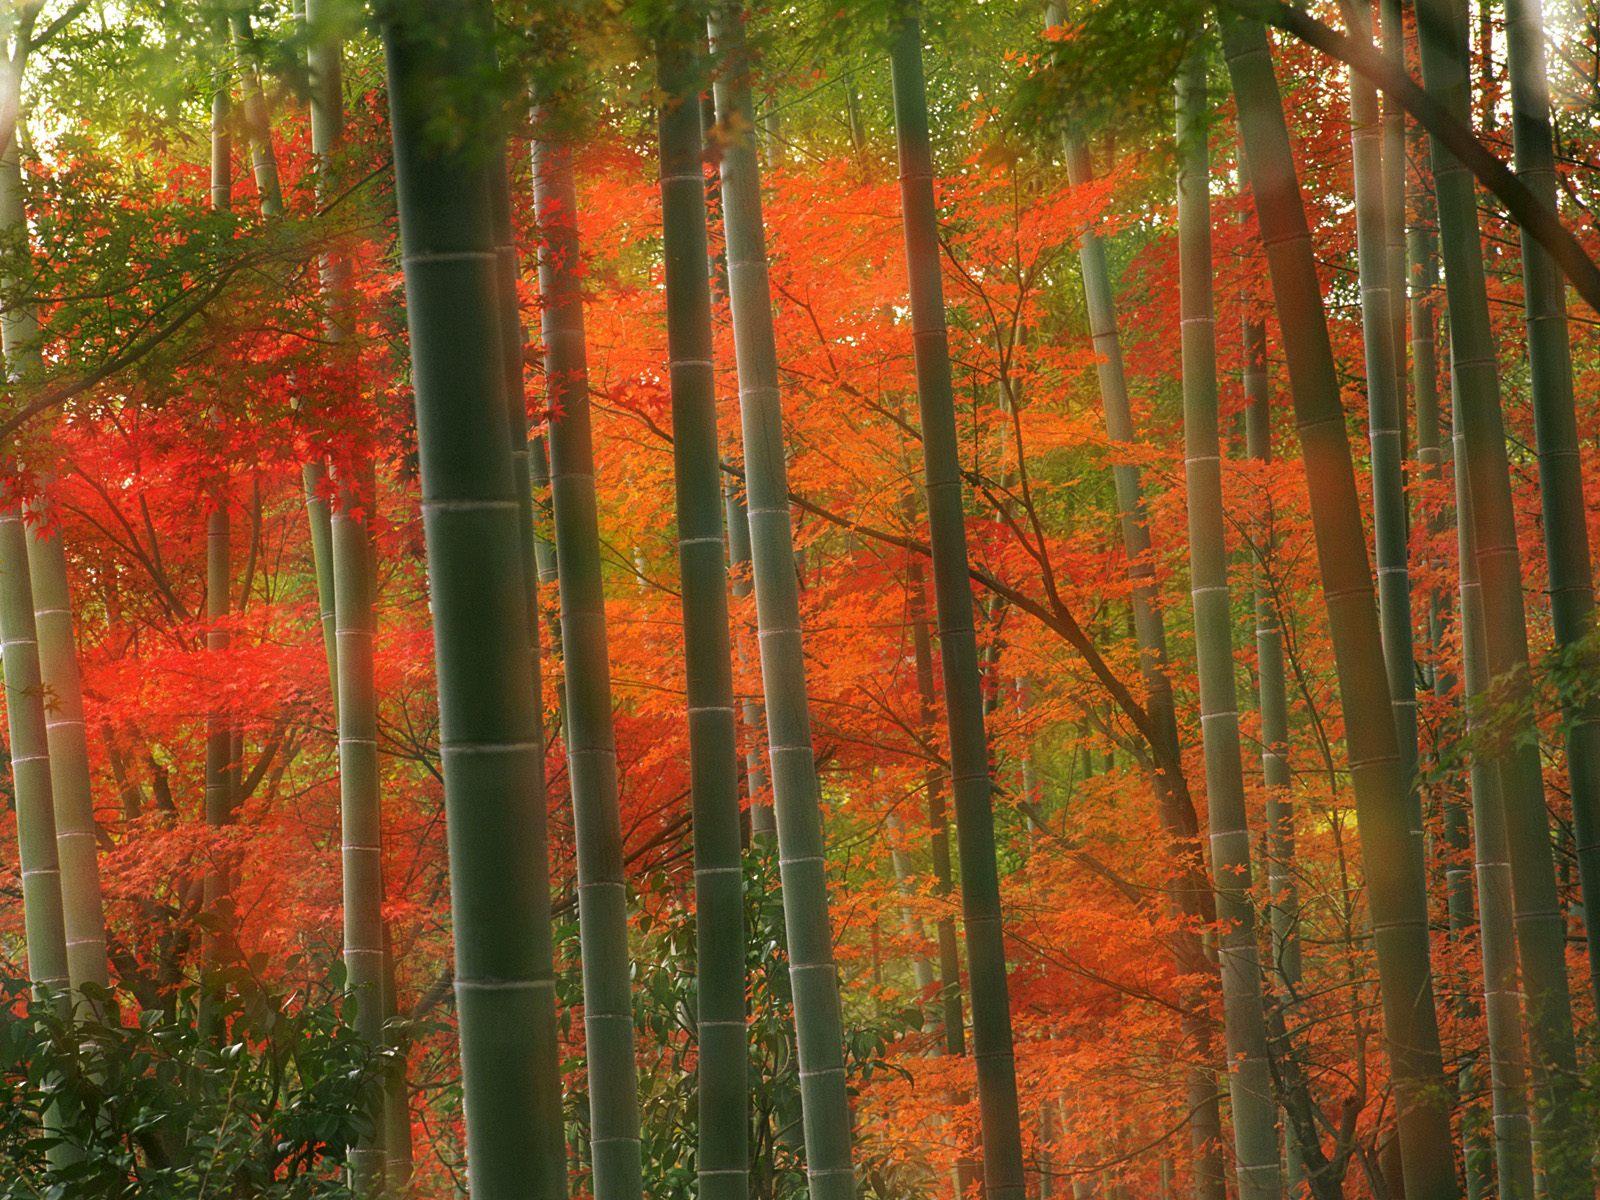 http://2.bp.blogspot.com/-GI4tyfWU-9g/Tk062dyeIQI/AAAAAAAAI48/u_ei9io9CwI/s1600/bamboo+wallpaper+Forest.jpg